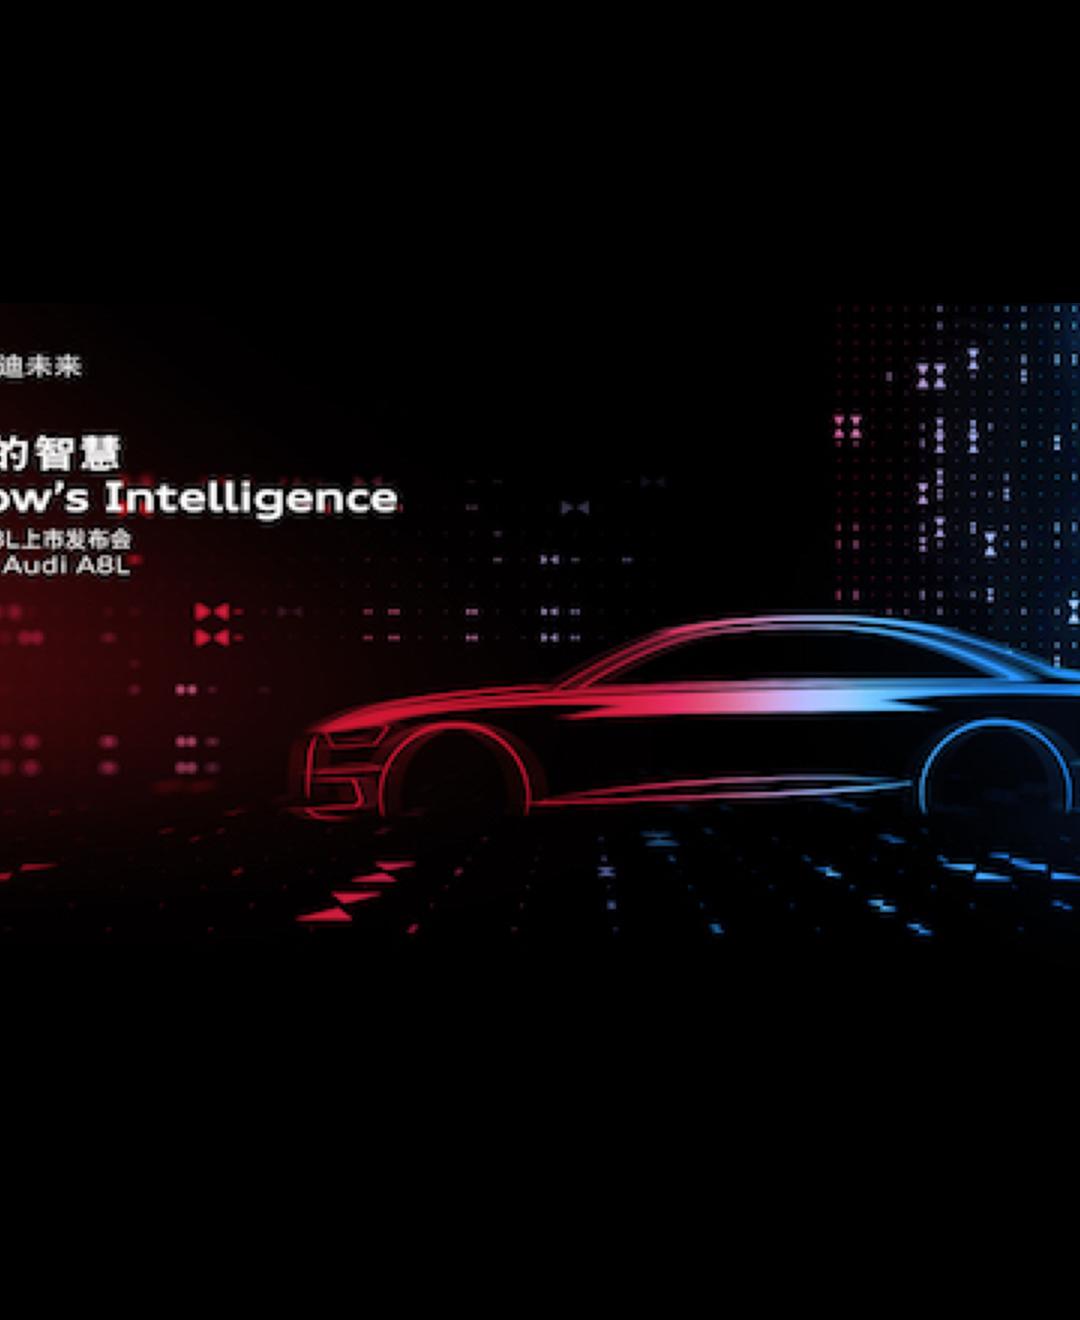 AUDI A8L National Launch Event, China – April 2018